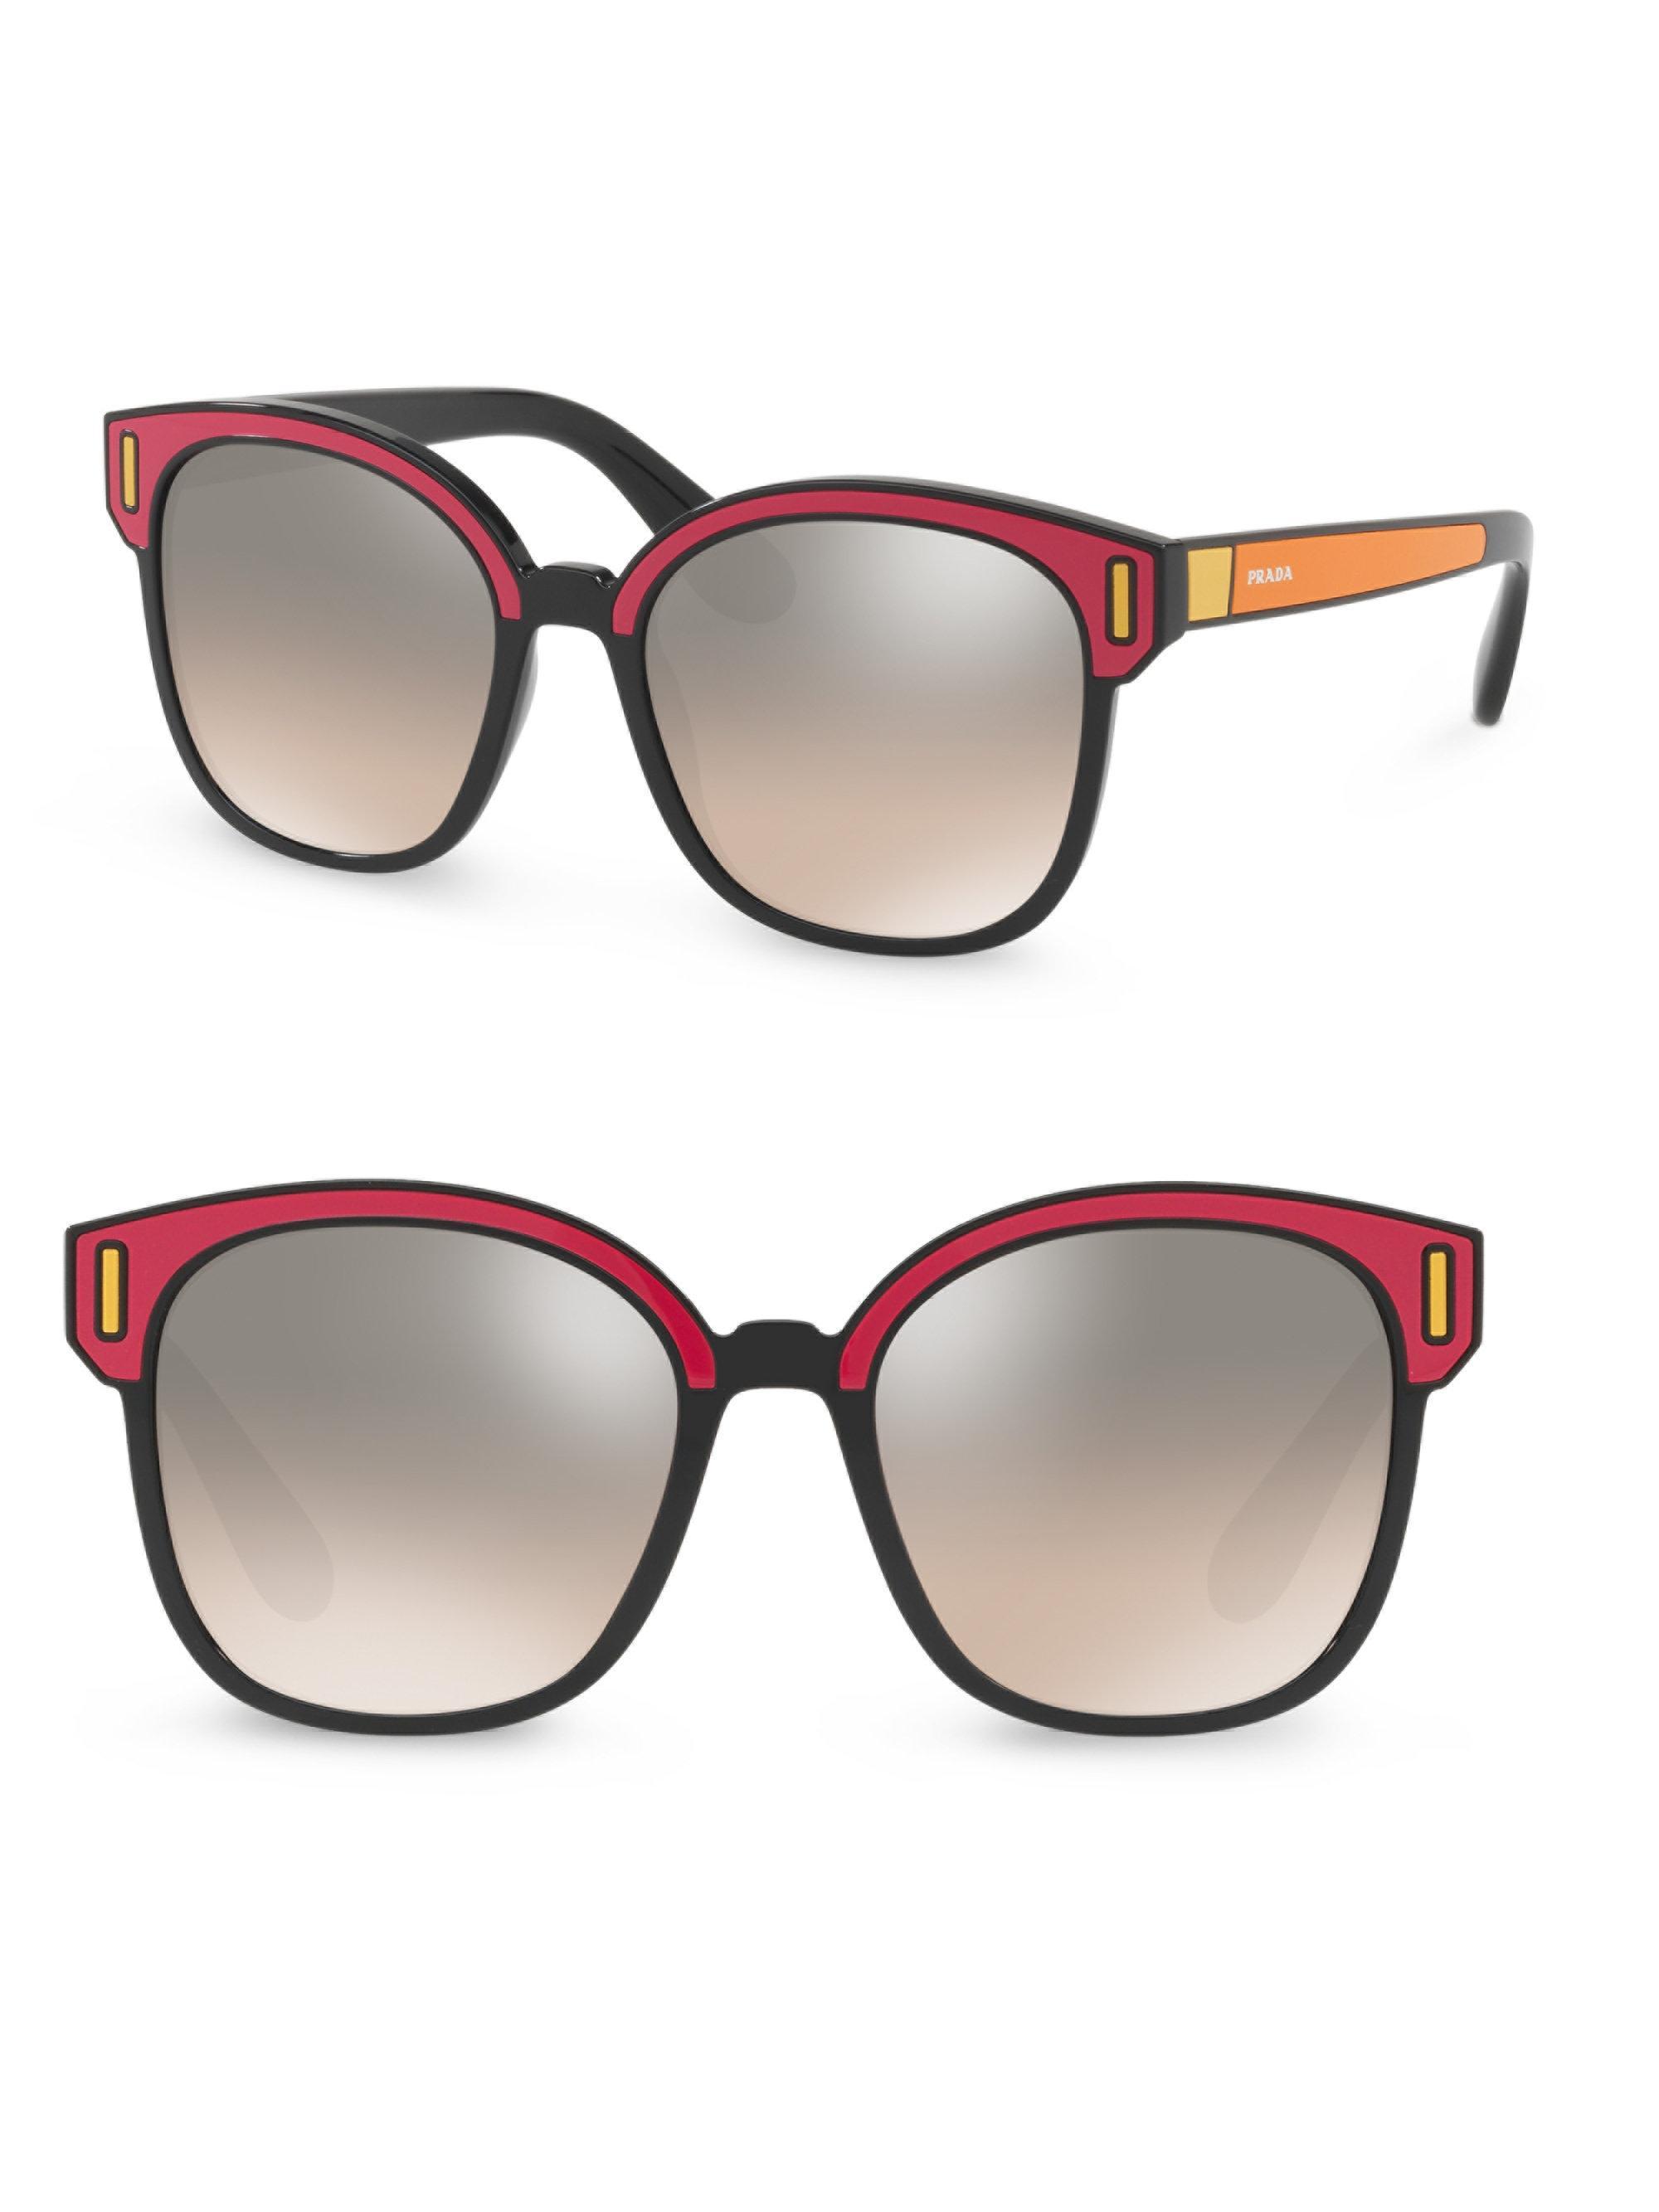 71d35deeb8 Lyst - Prada Color Pop Mirrored Lens Sunglasses in Brown